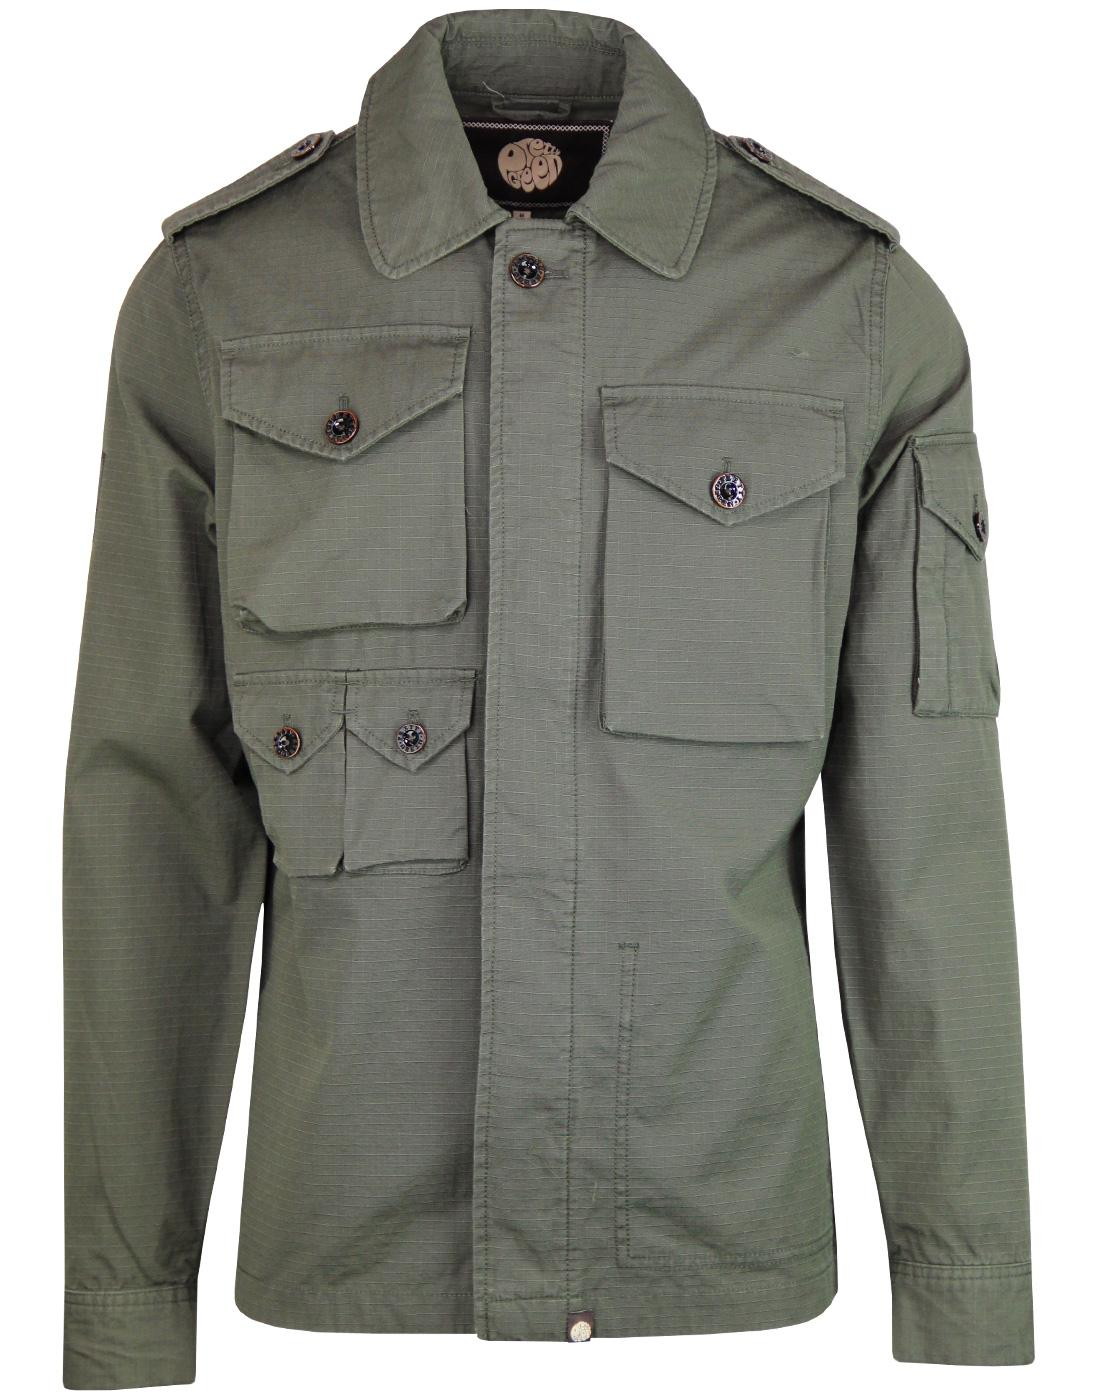 PRETTY GREEN Men's Mod M65 Military Field Jacket